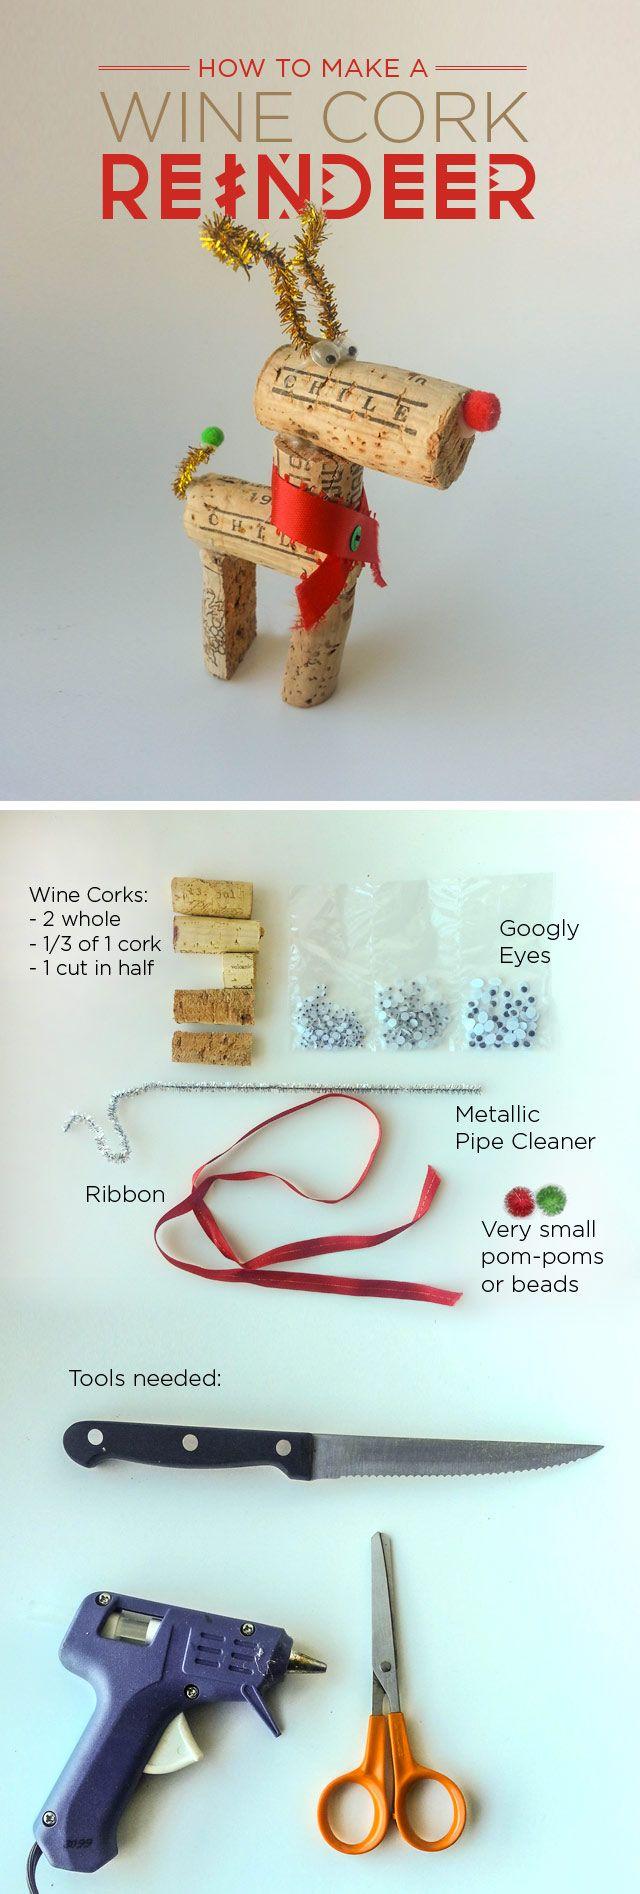 How to make a Wine Cork Reindeer @Carolena Barringer Barringer Belle @MacKenzie Cunningham @Lauren Davison Davison Trojacek because we all know you will have some of these left over